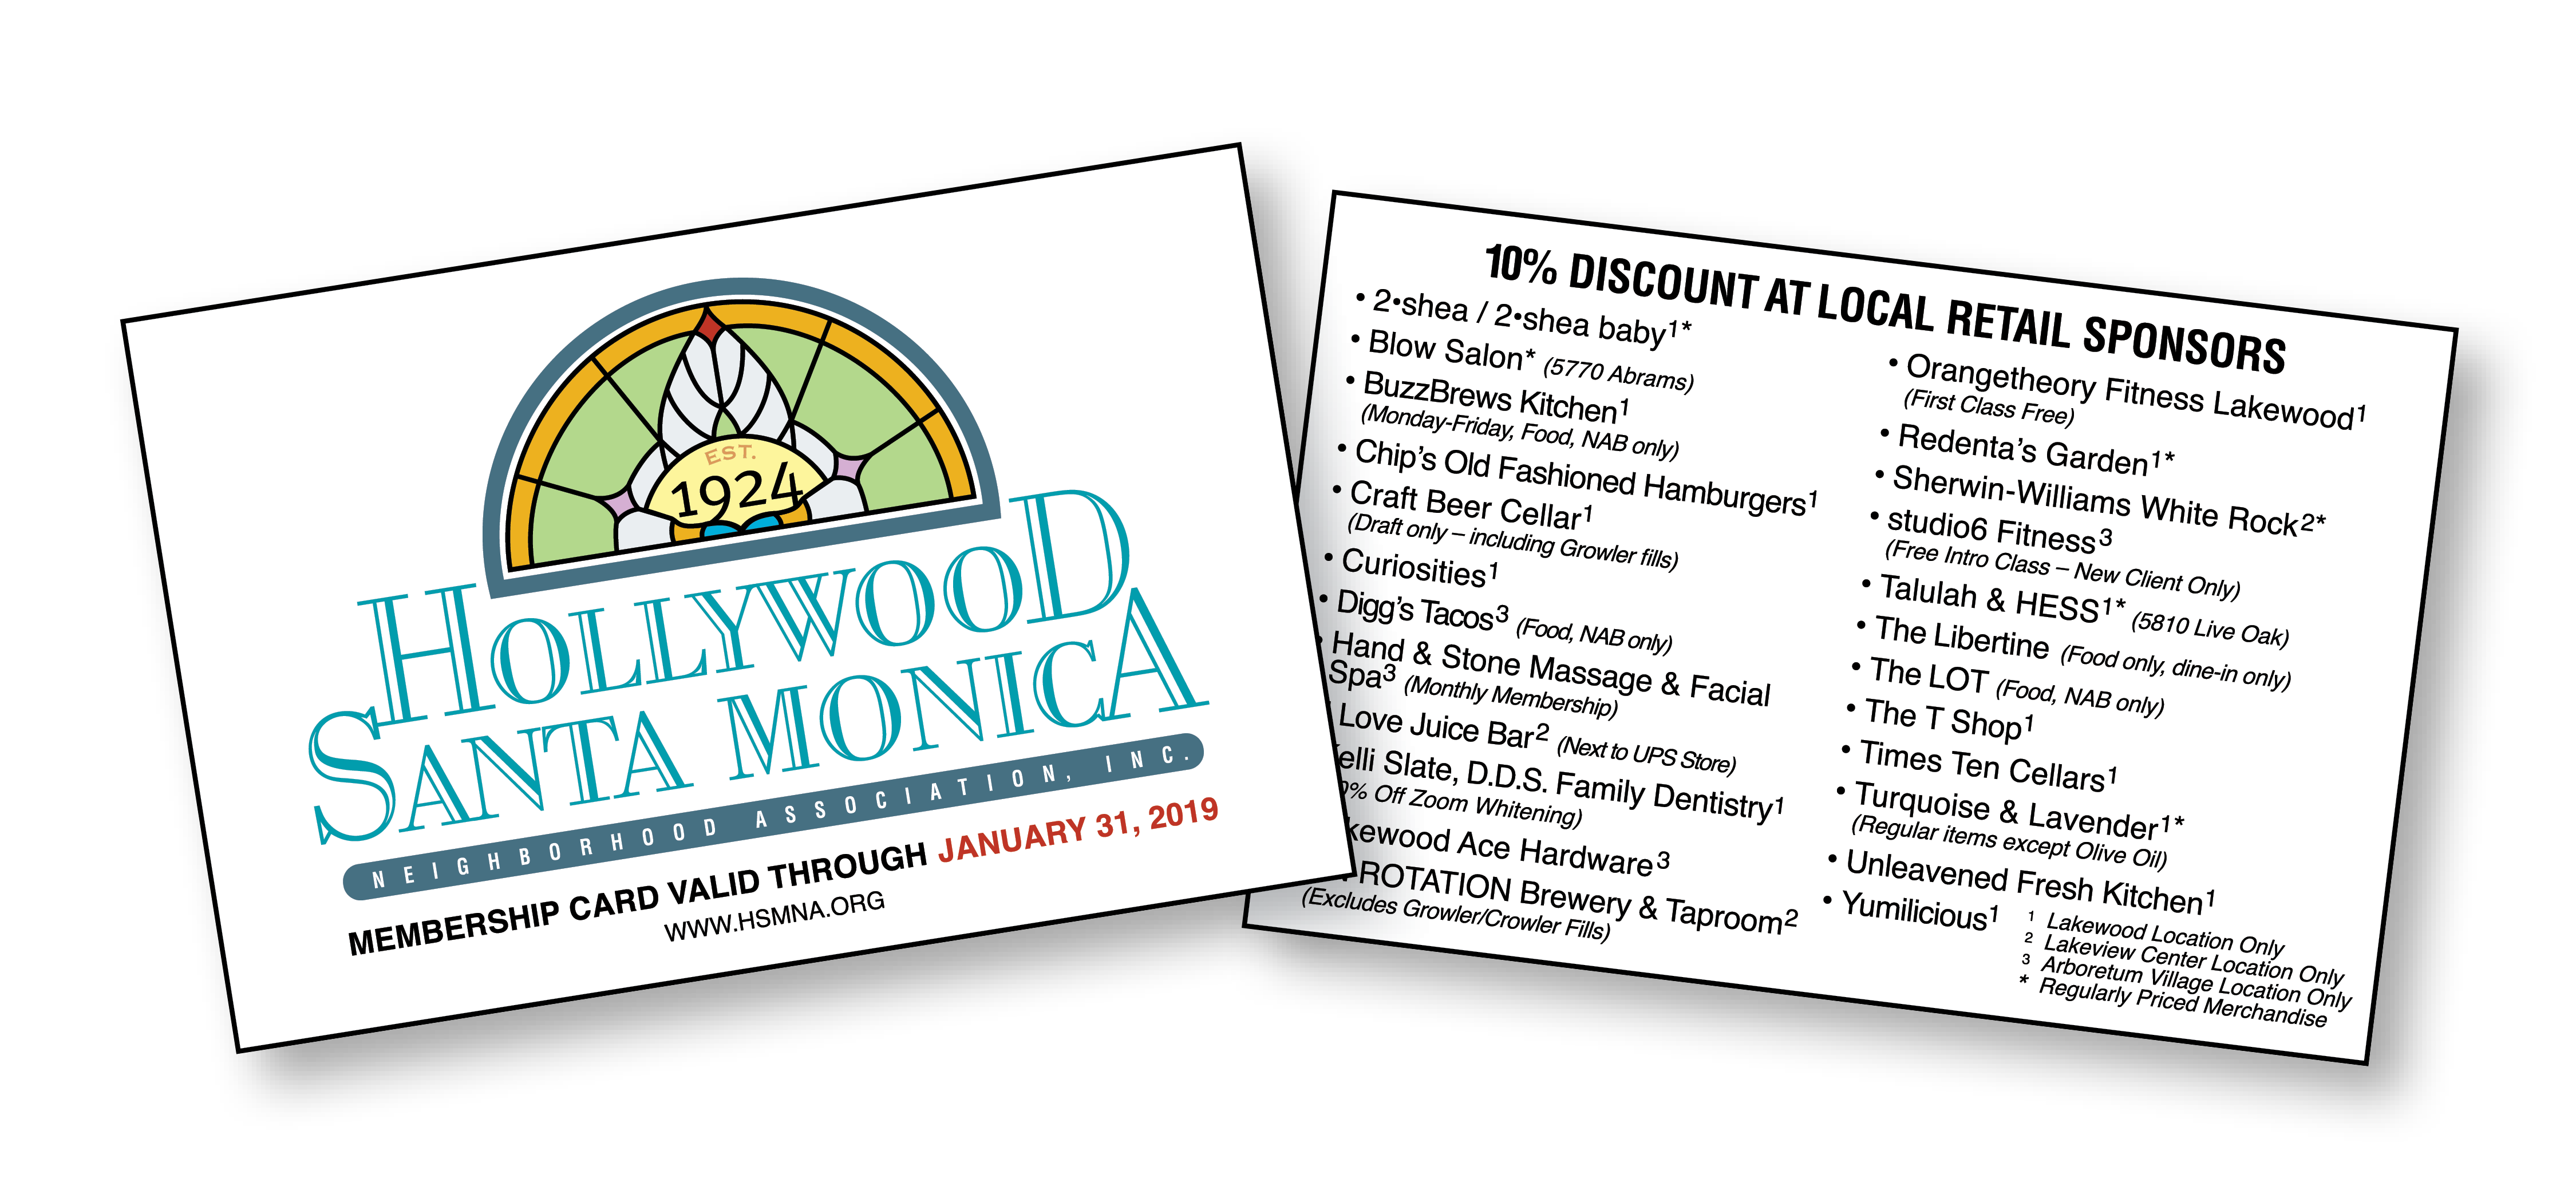 Hollywood/Santa Monica Neighborhood Association - Home